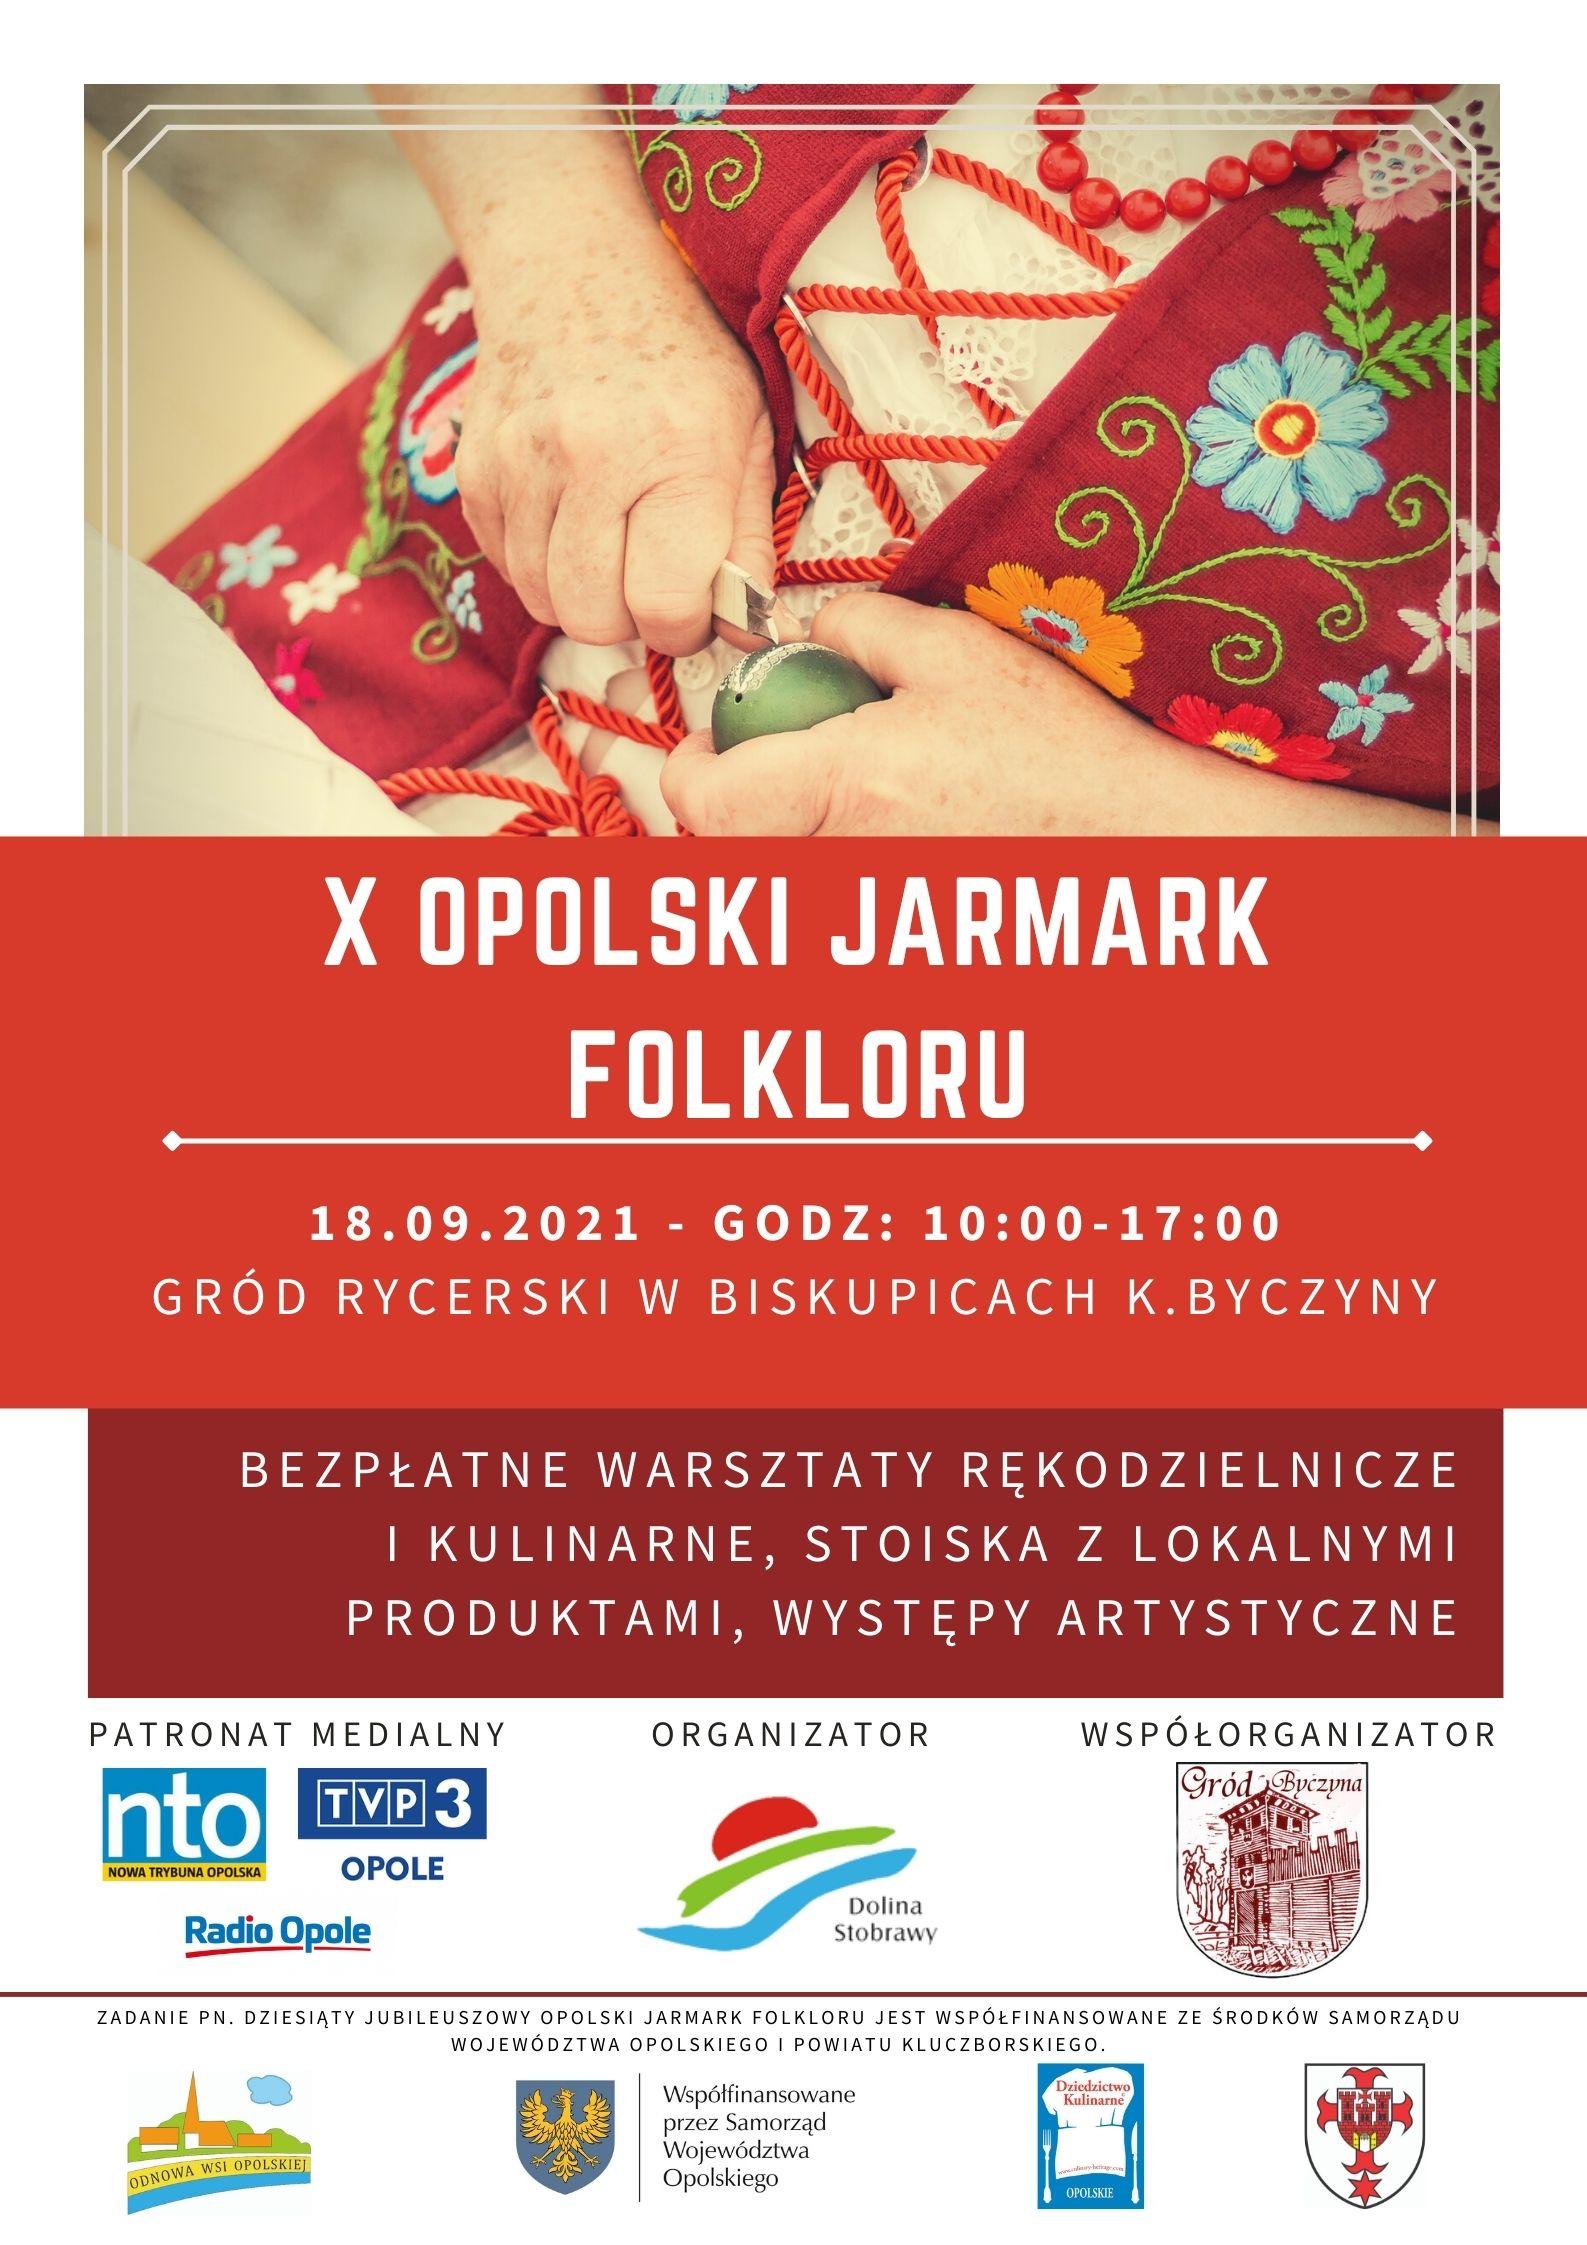 Plakat. X Opolski Jarmark Folkloru